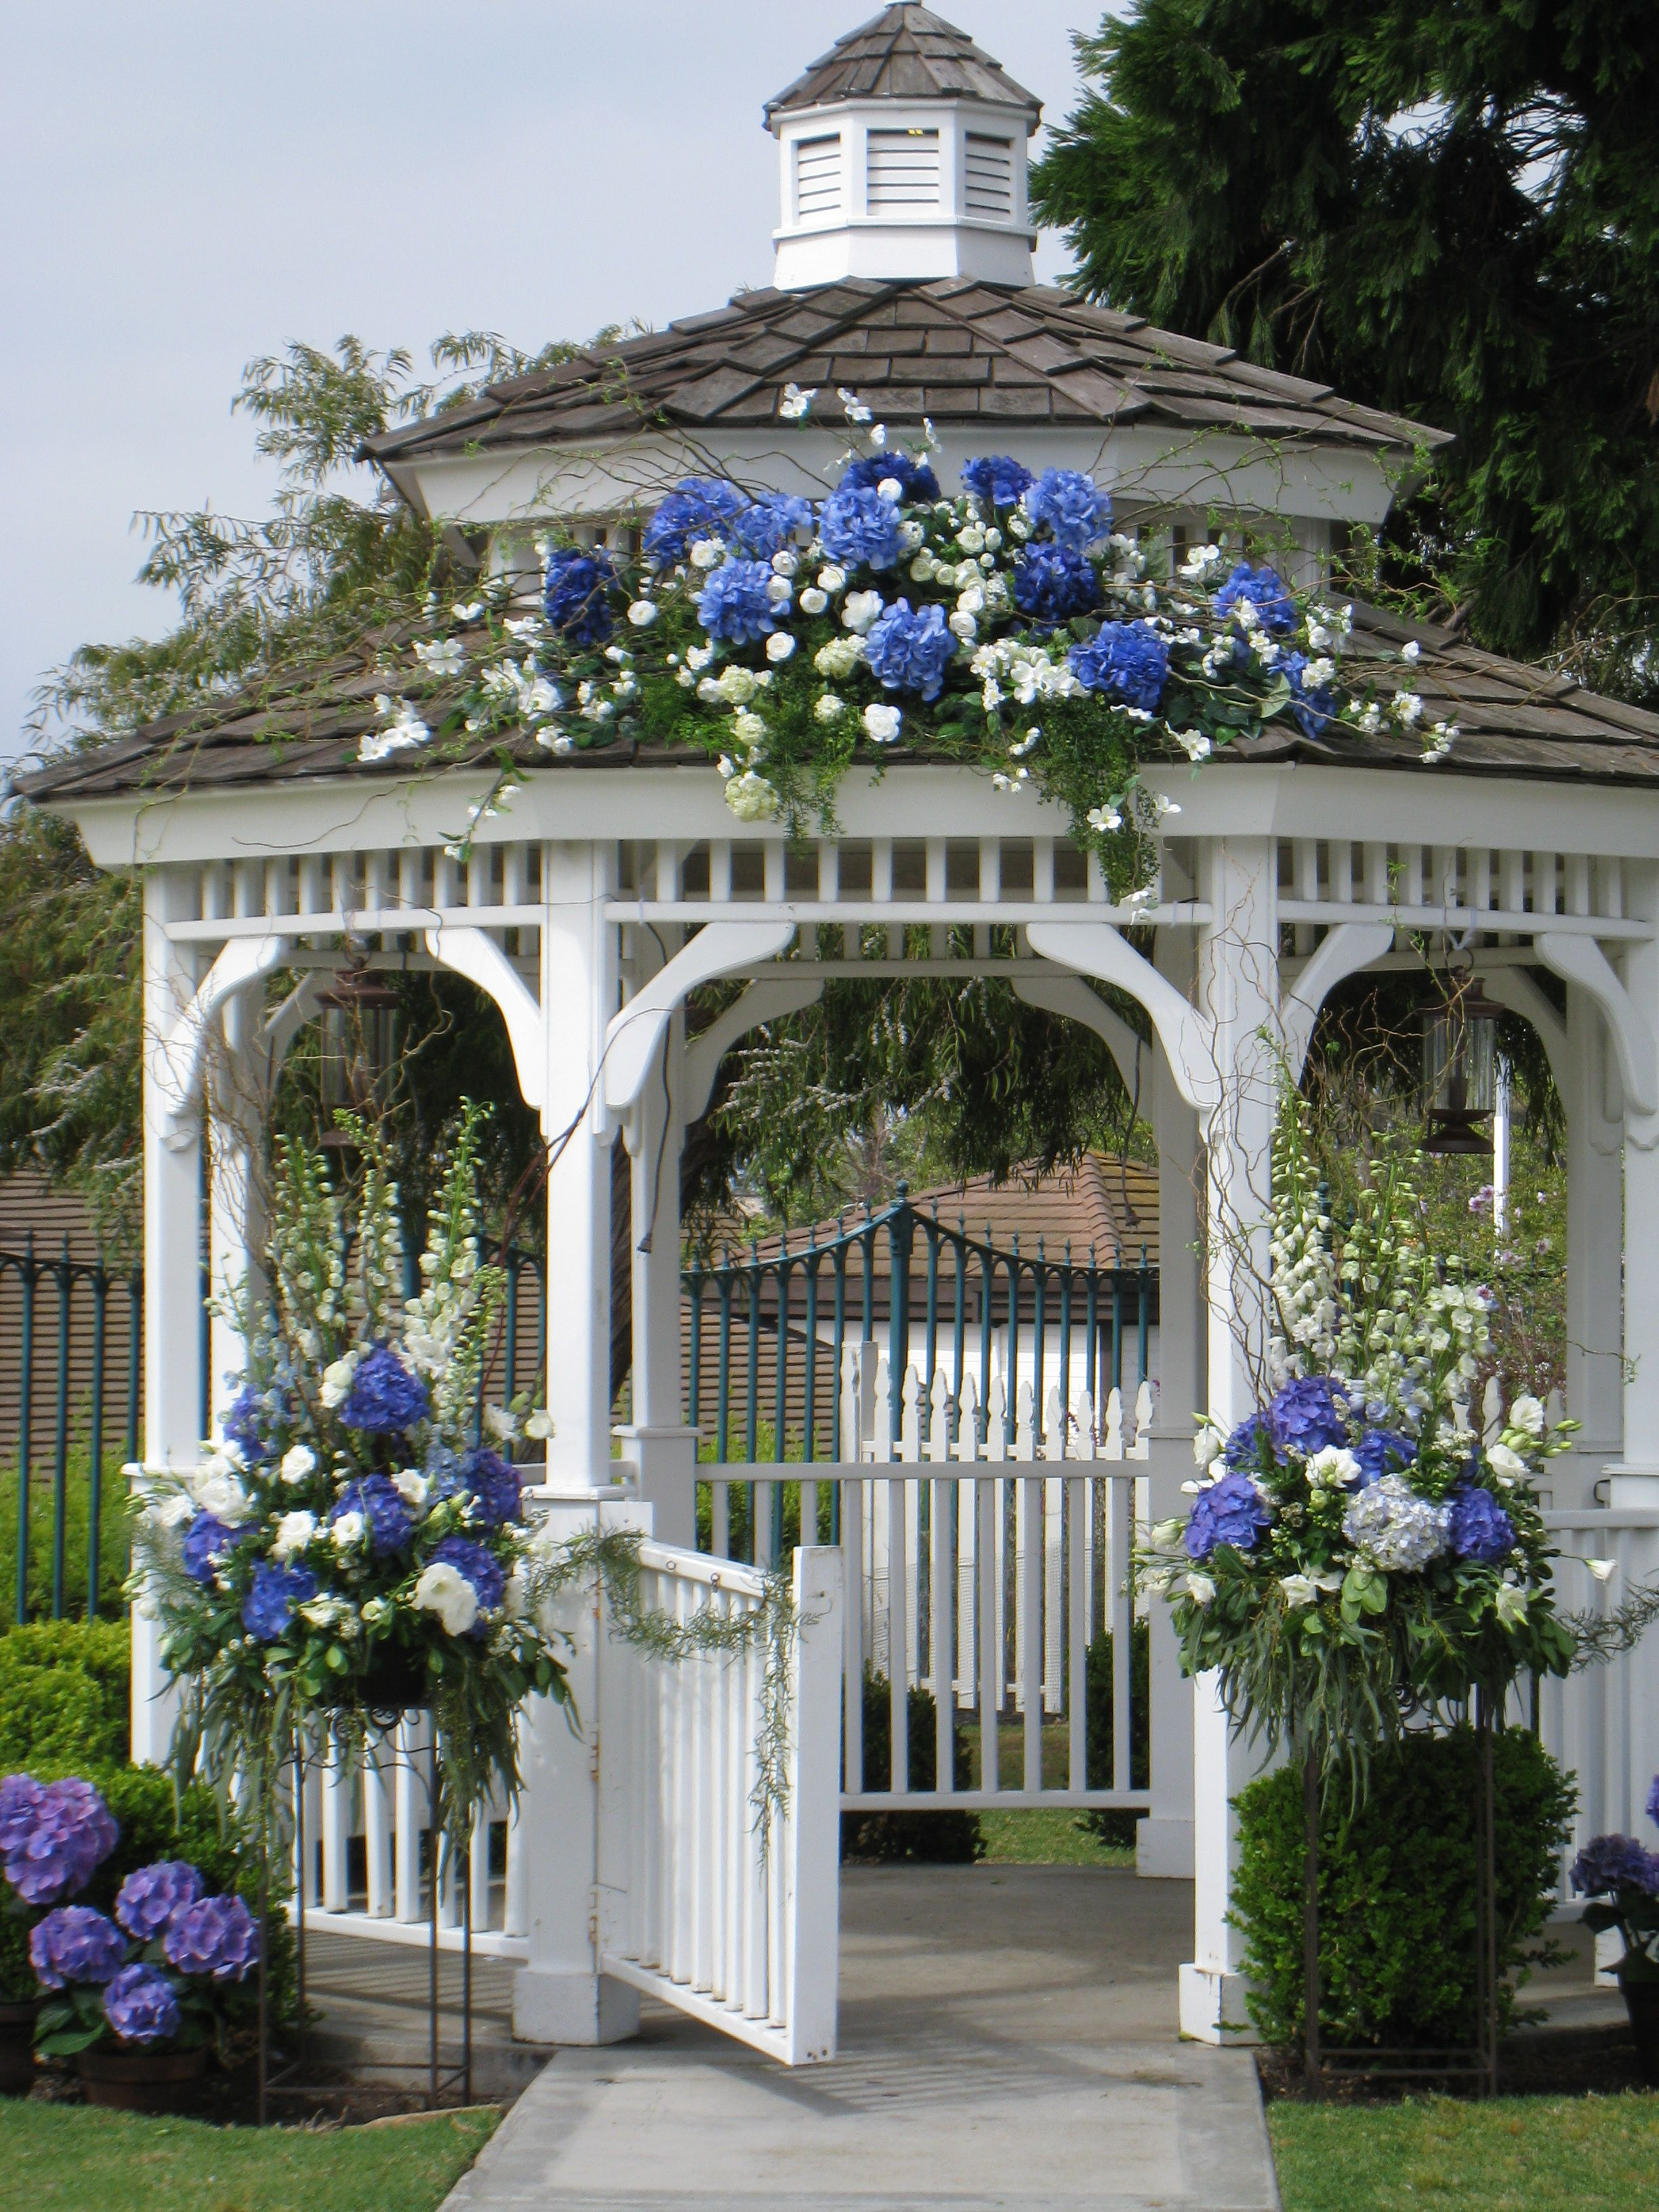 Decorated Wedding Gazebos For Sale Garden Gazebo Gazebo Wedding